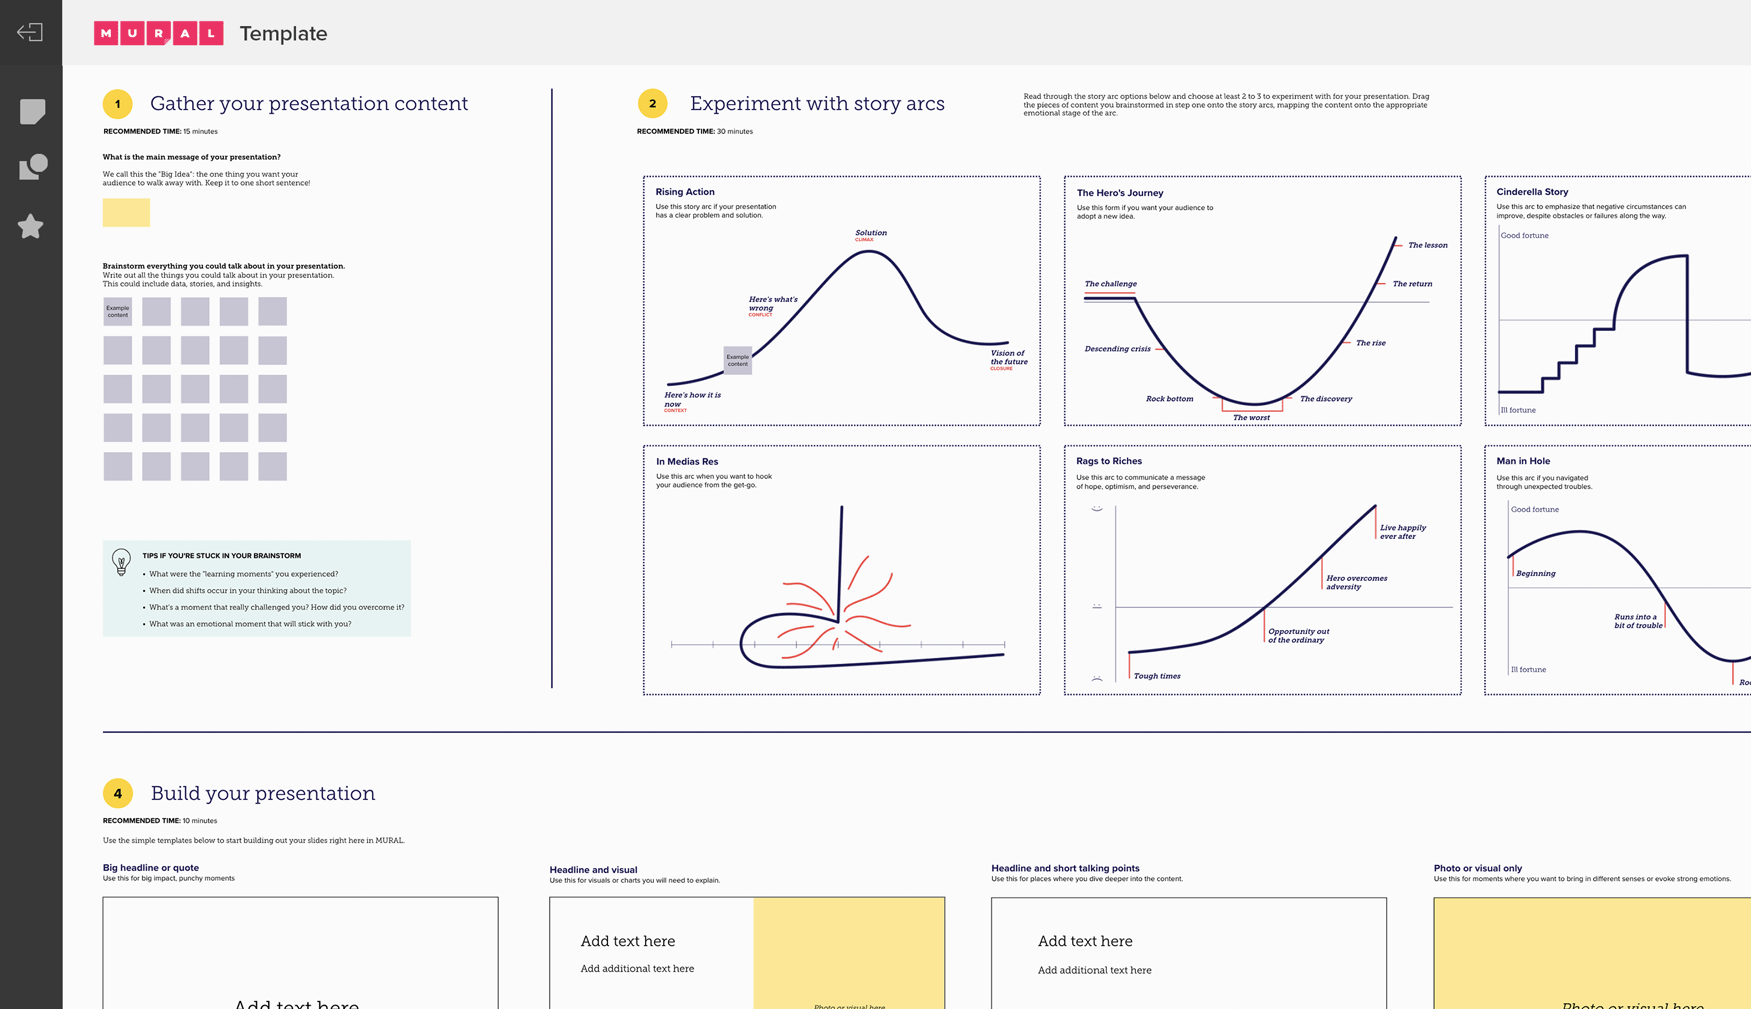 IDEO U Template Toolkit